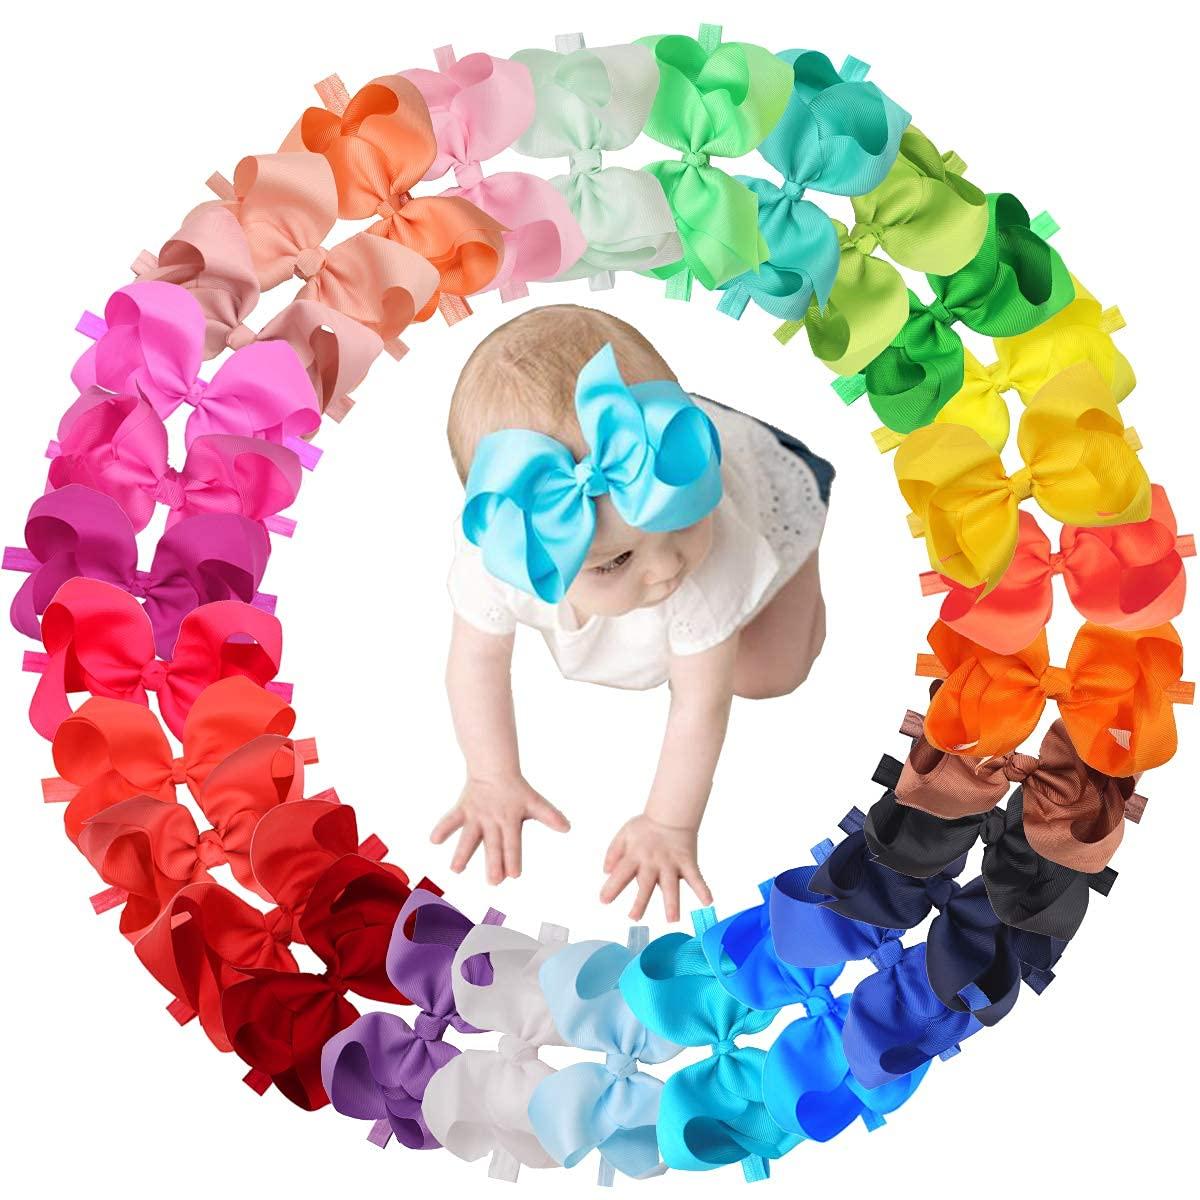 30 Colors Baby online shopping Girls Phoenix Mall Headbands Bows Big 6Inch Elastic Hair